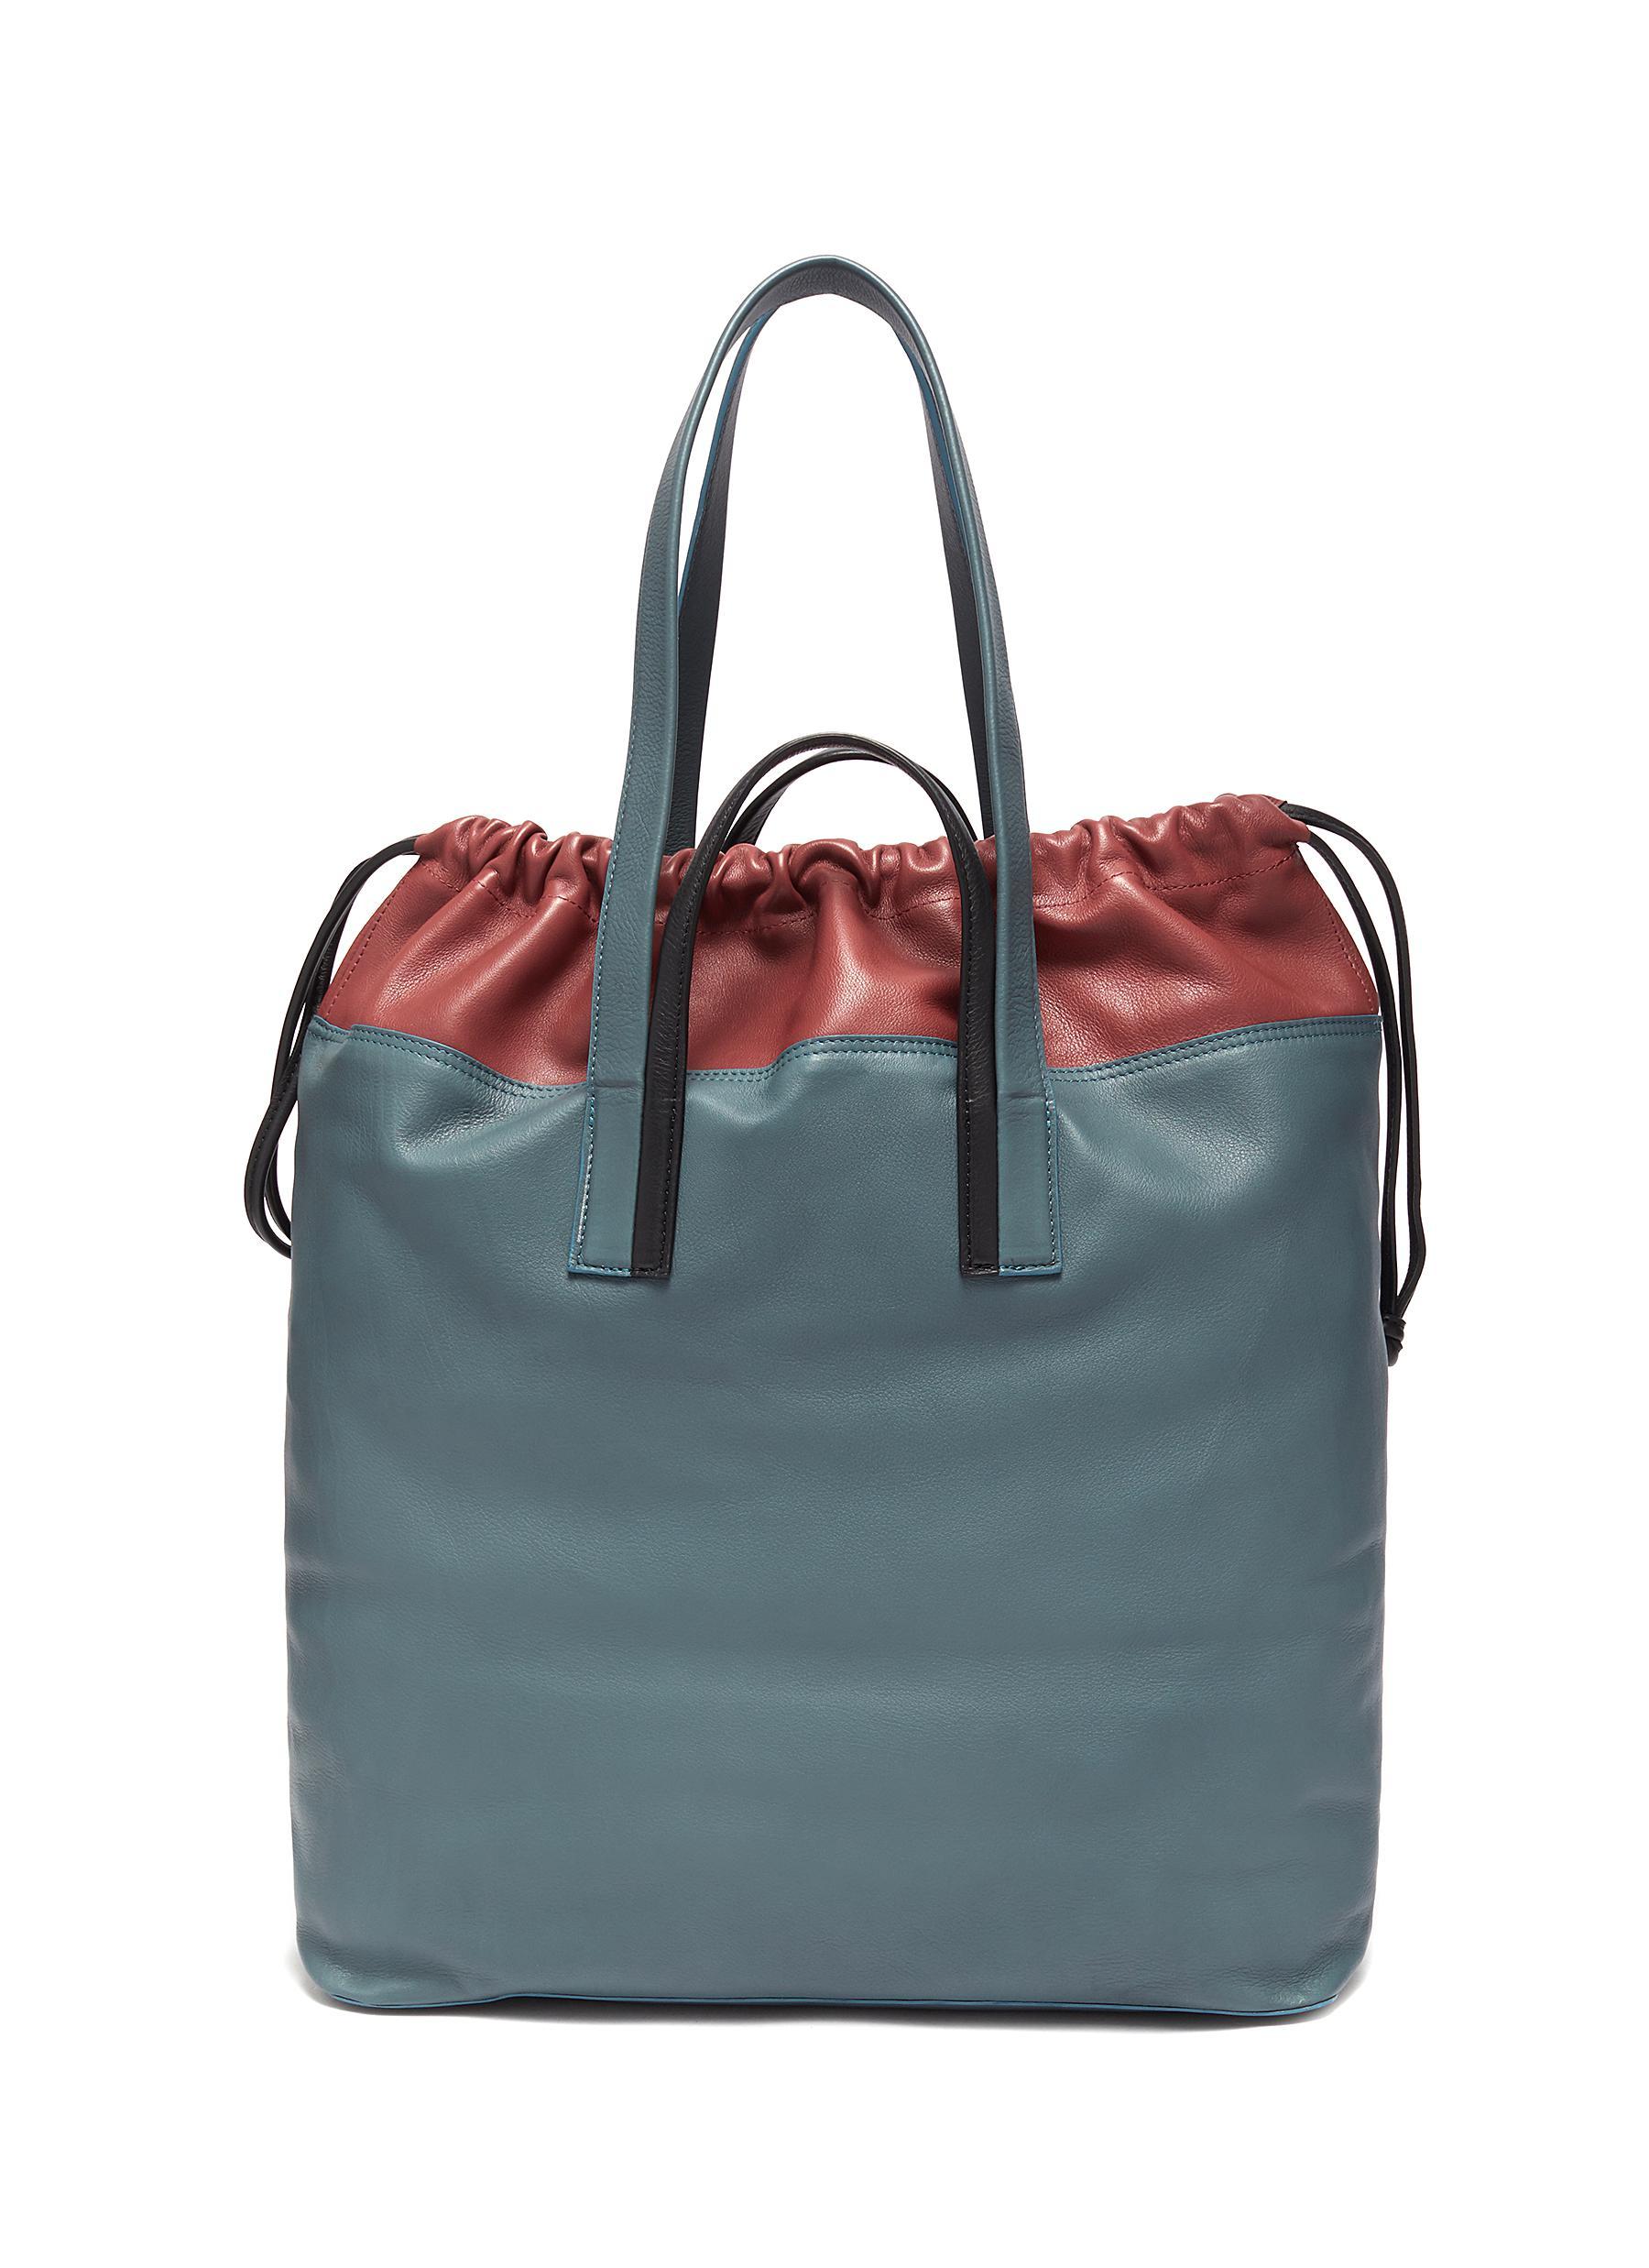 Cabas' Bicoloured Grained Calfskin Leather Twin Tote Bag - PIERRE HARDY - Modalova